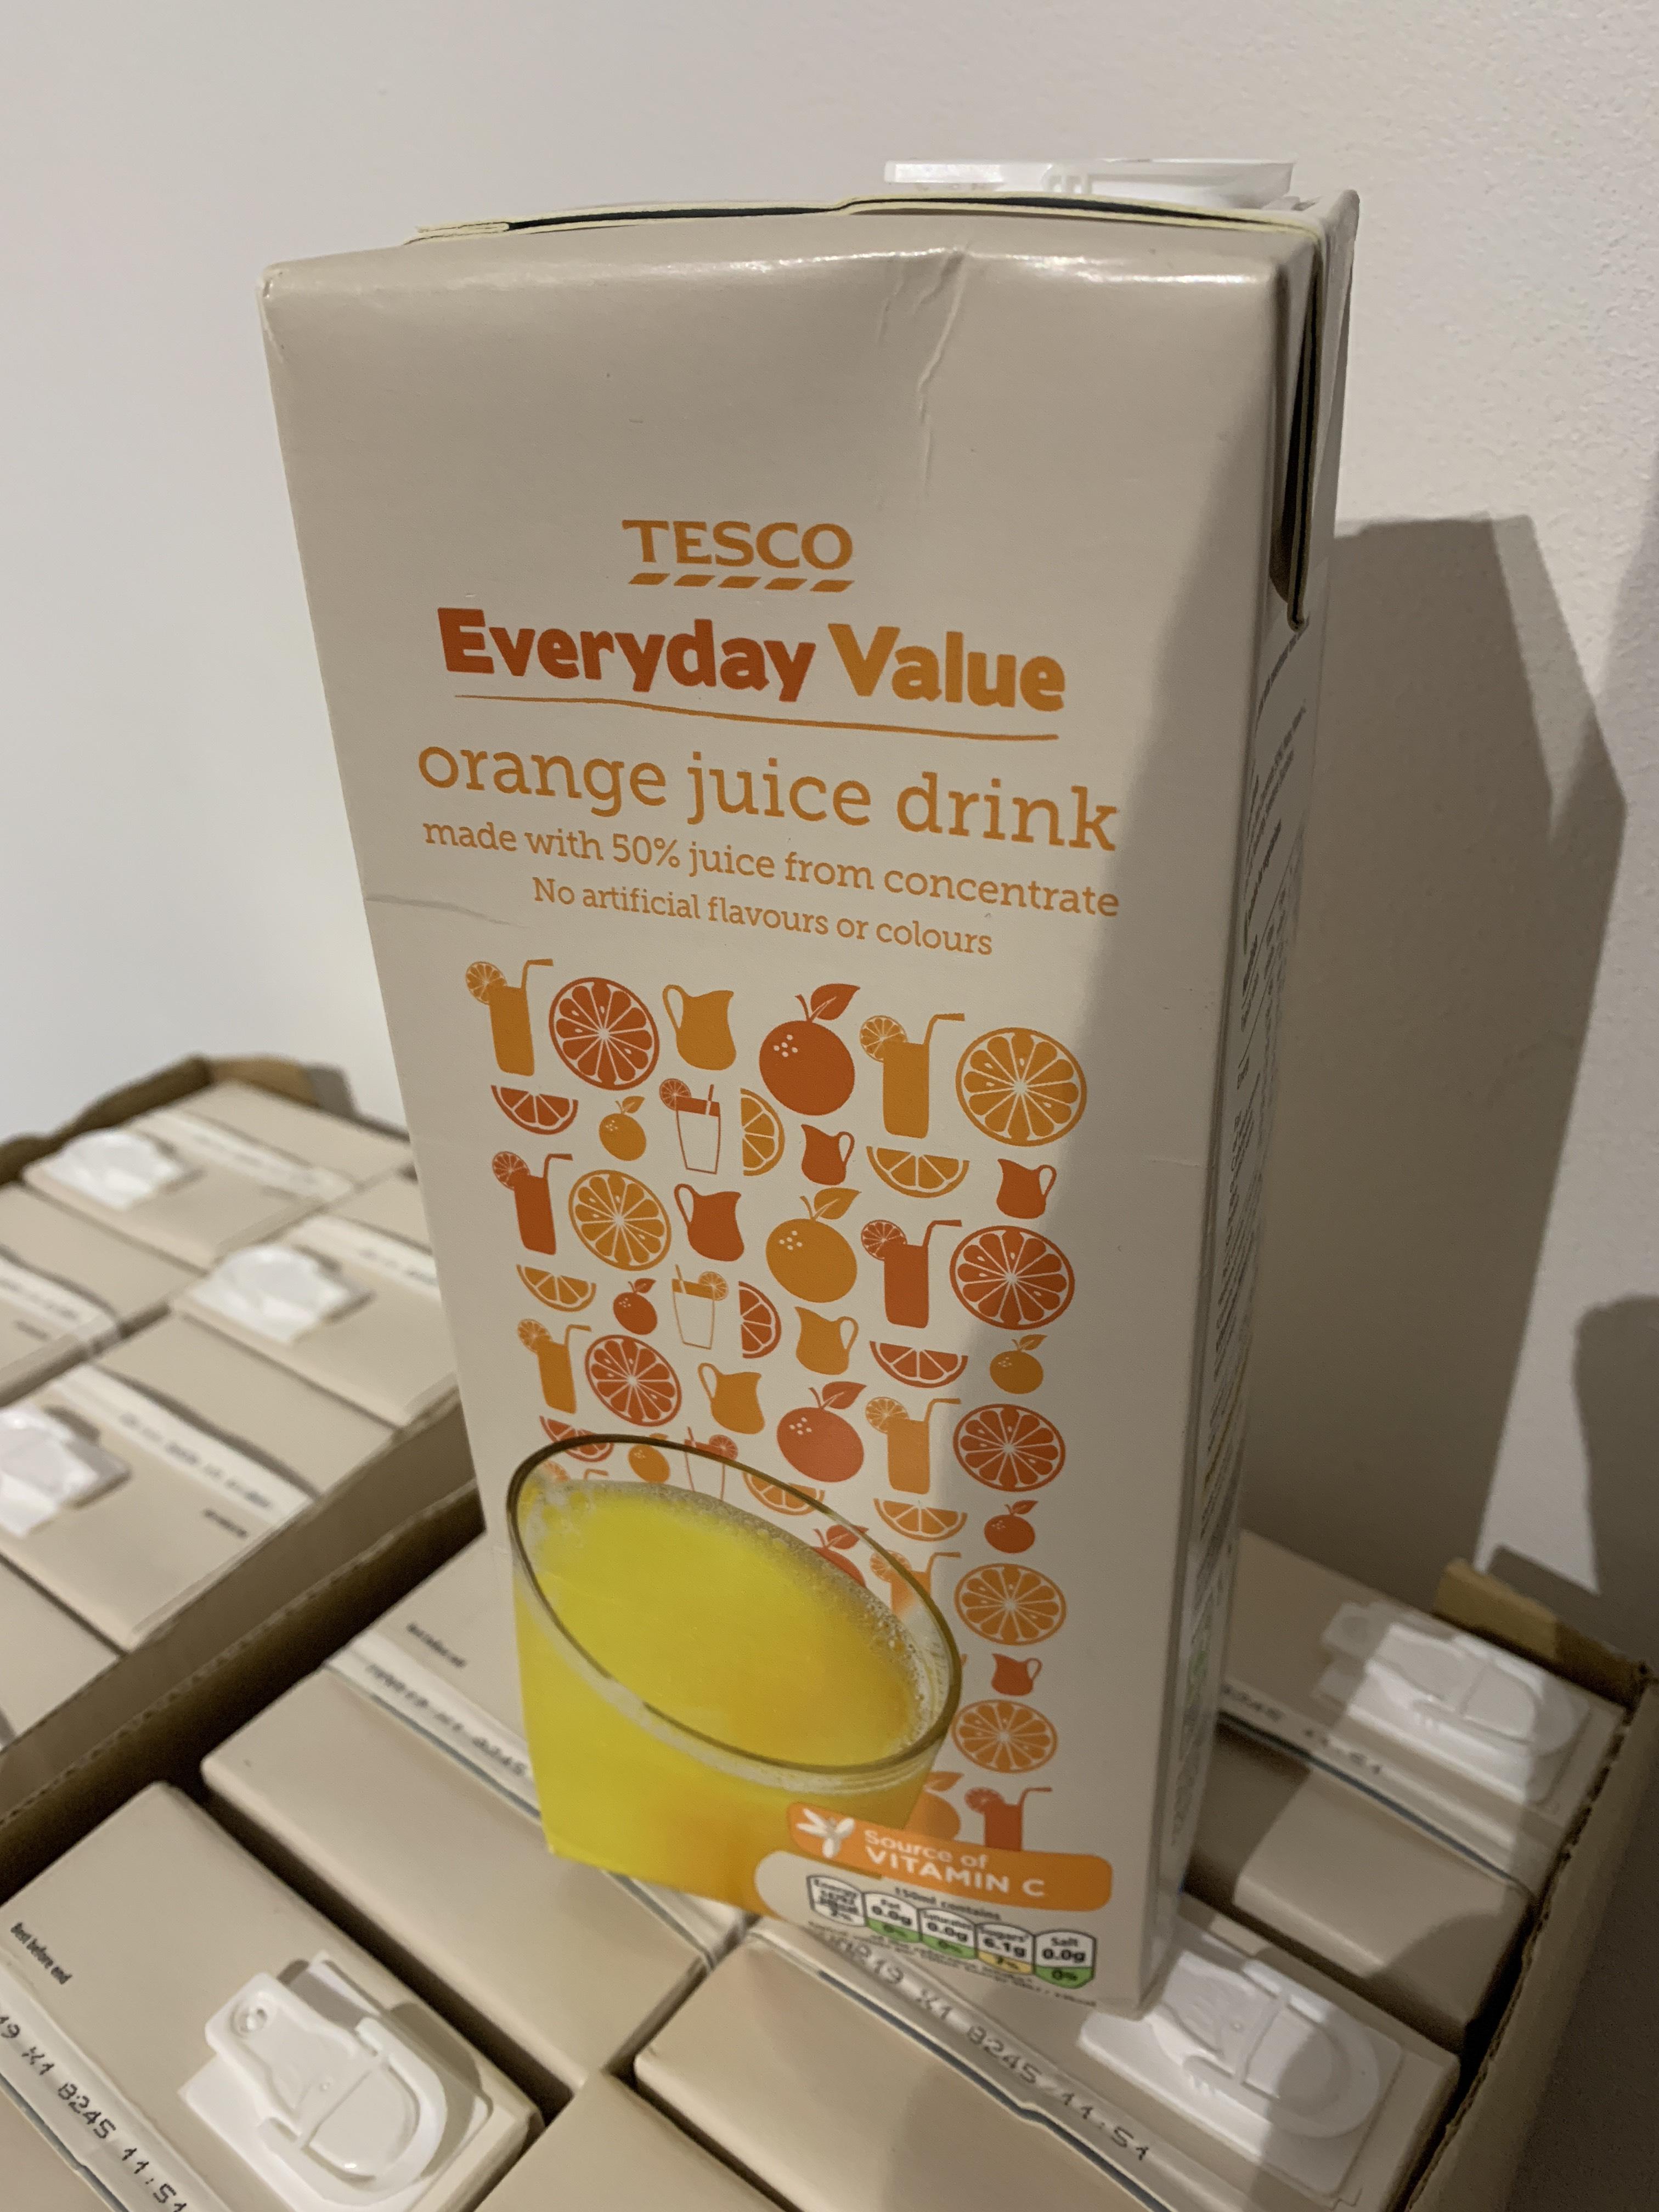 Tesco Everyday Value Orange Juice Drink 1.5L 37p instore